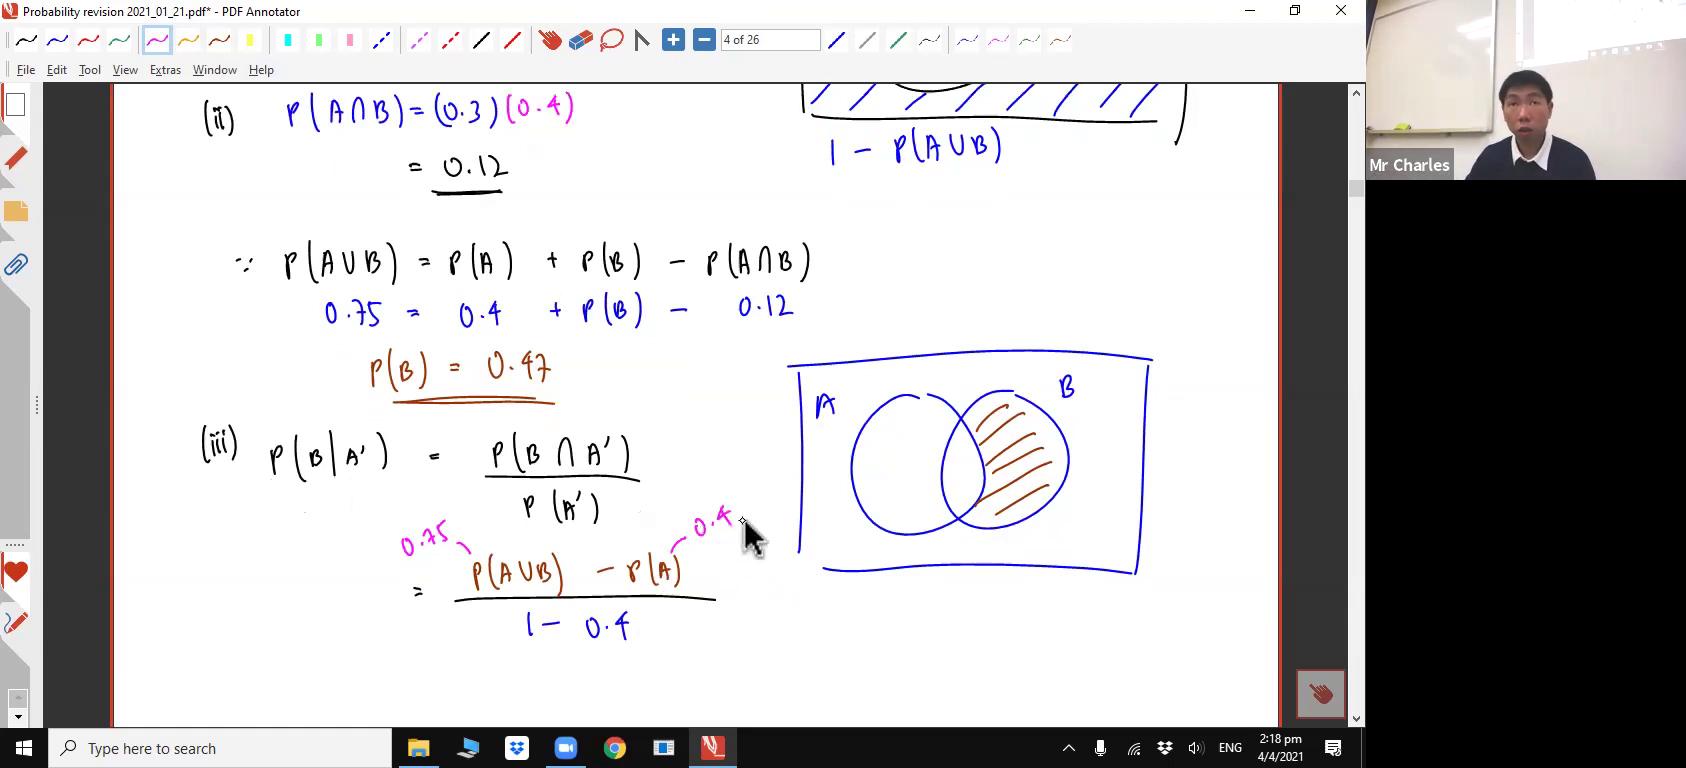 [PROBABILITY REVISION] Venn Diagrams